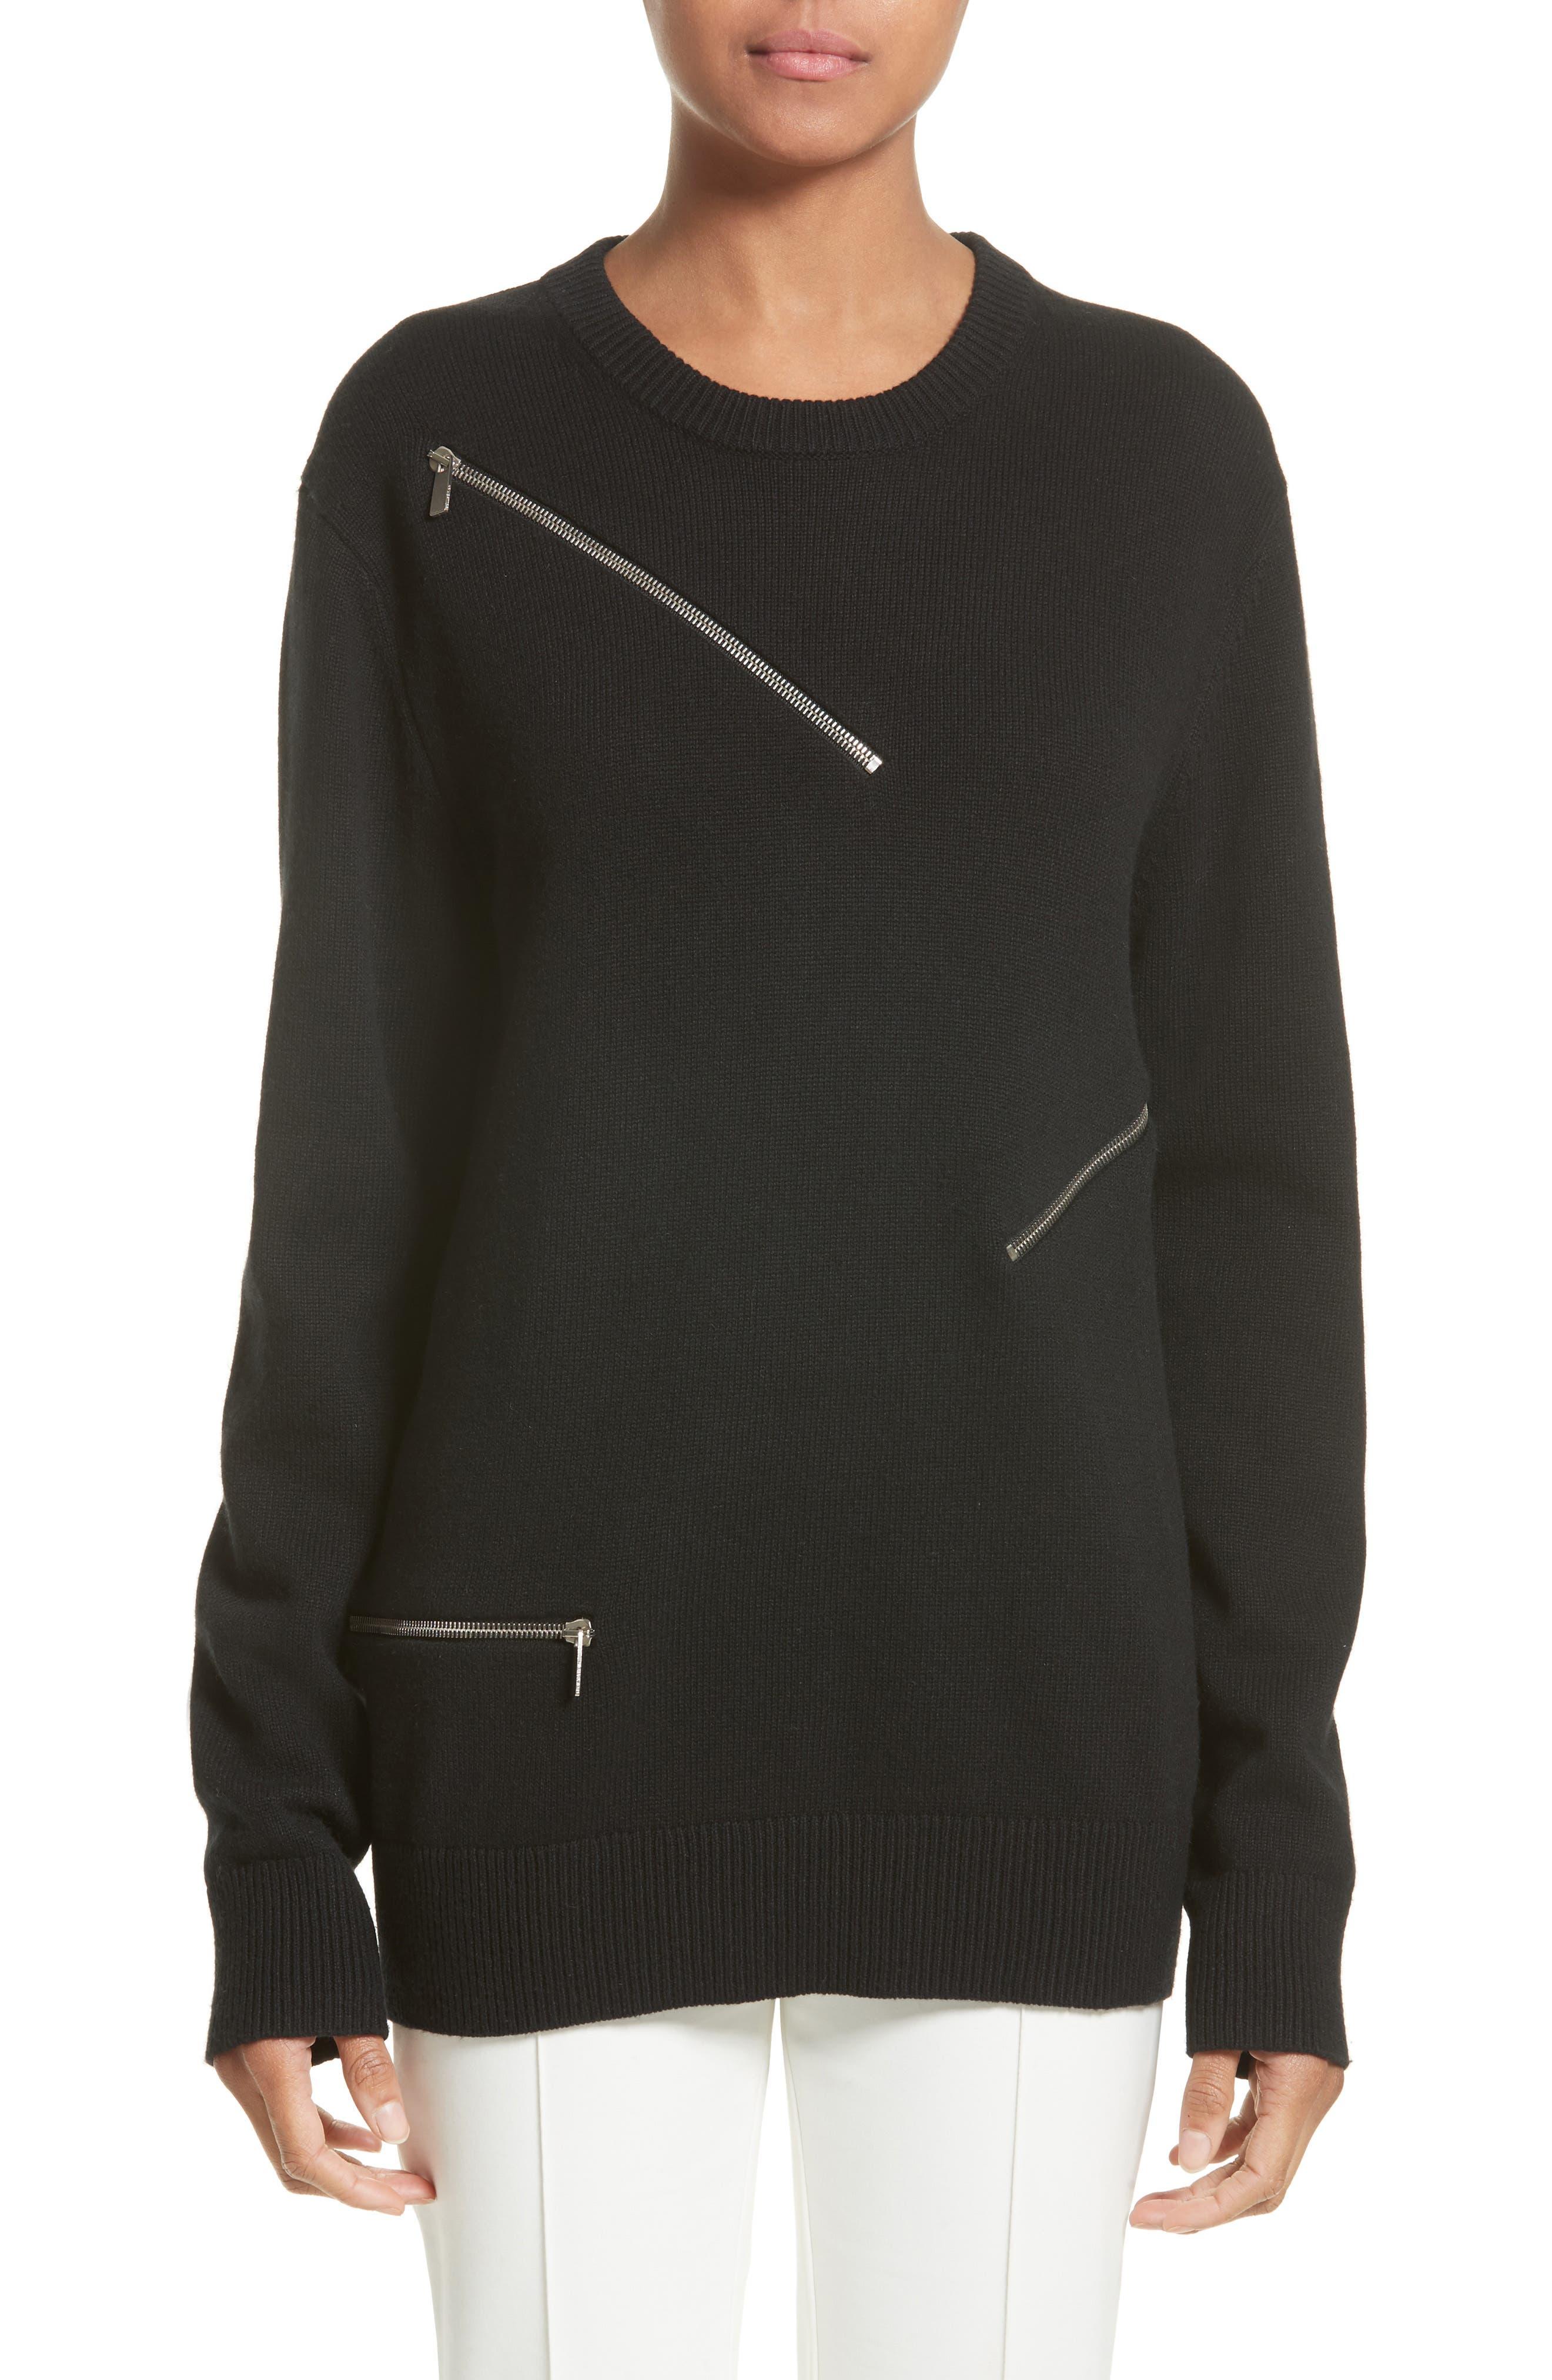 Alternate Image 1 Selected - Michael Kors Zip Detail Cashmere & Cotton Sweater